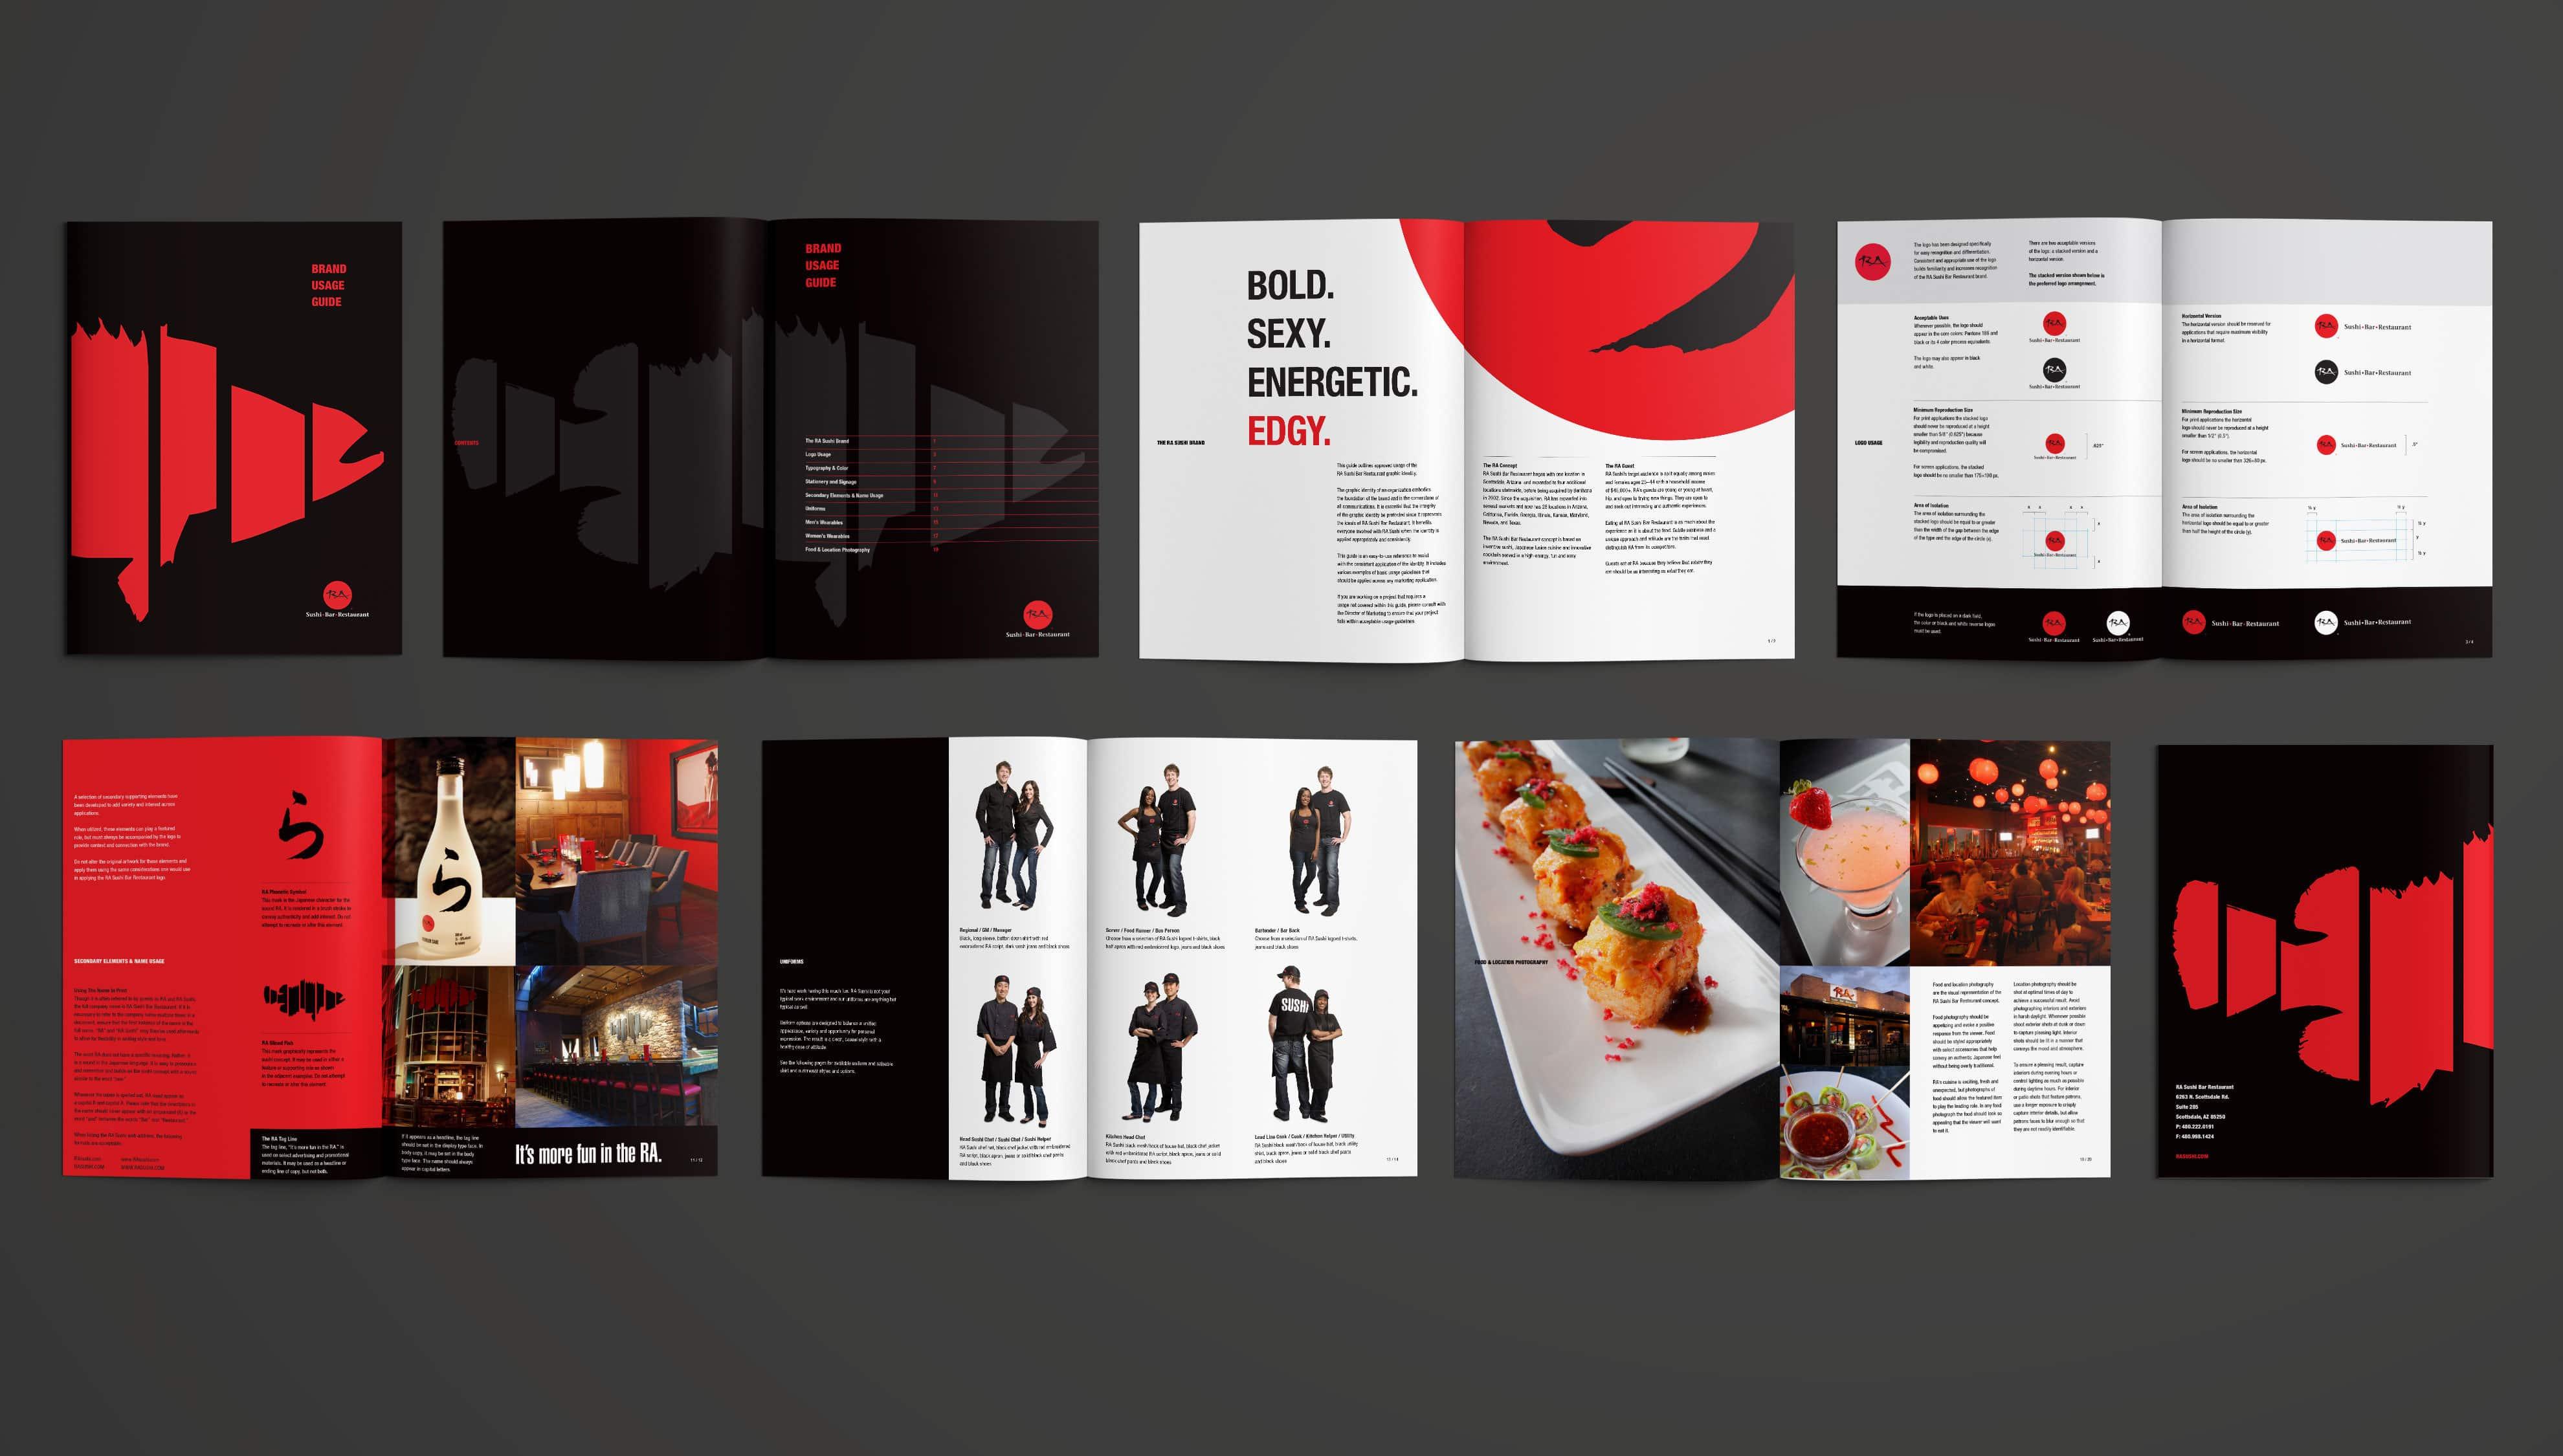 Branding work — Brand Standards